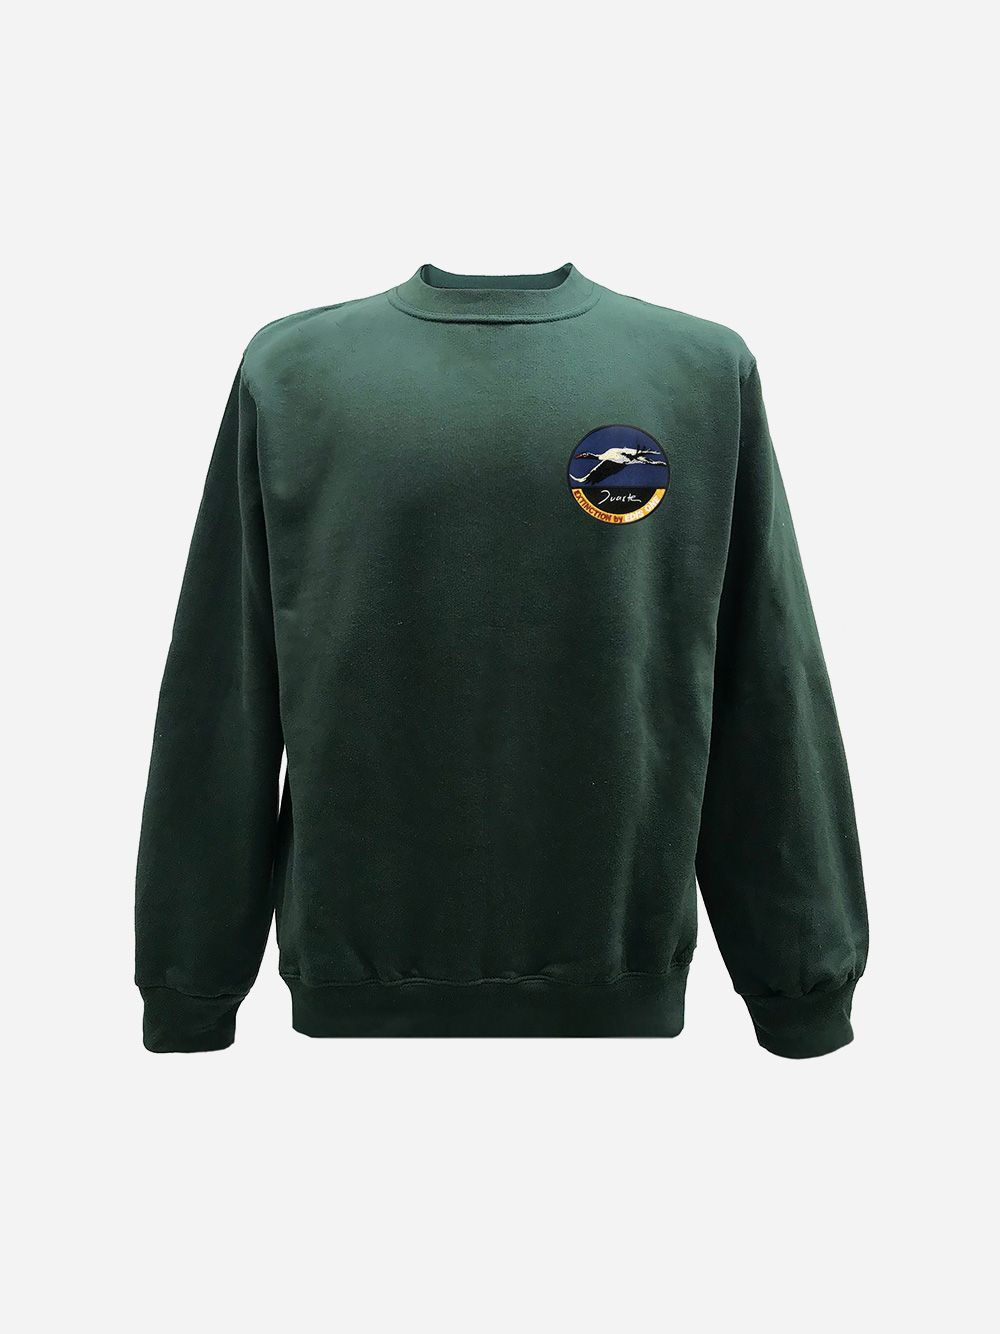 Sweatshirt Extinction Crane | Duarte